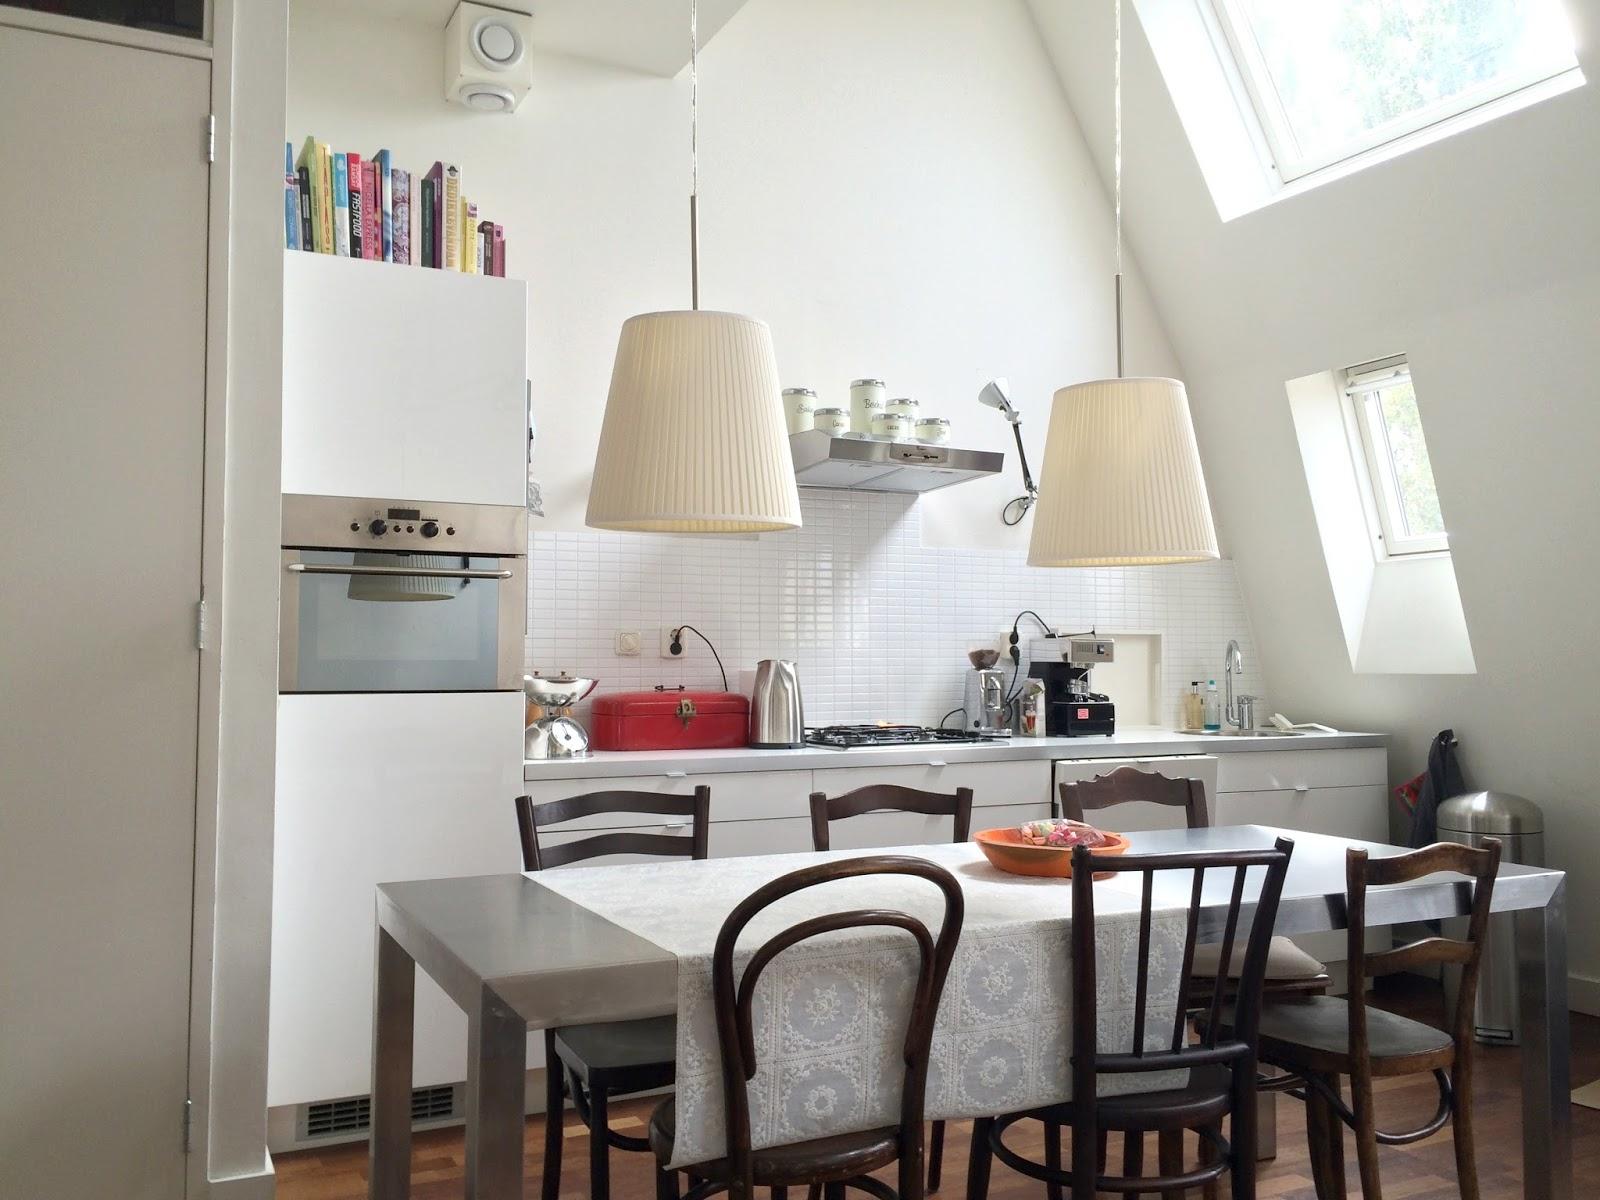 Le strict maximum amsterdam - Entrepot ceramique decor ...